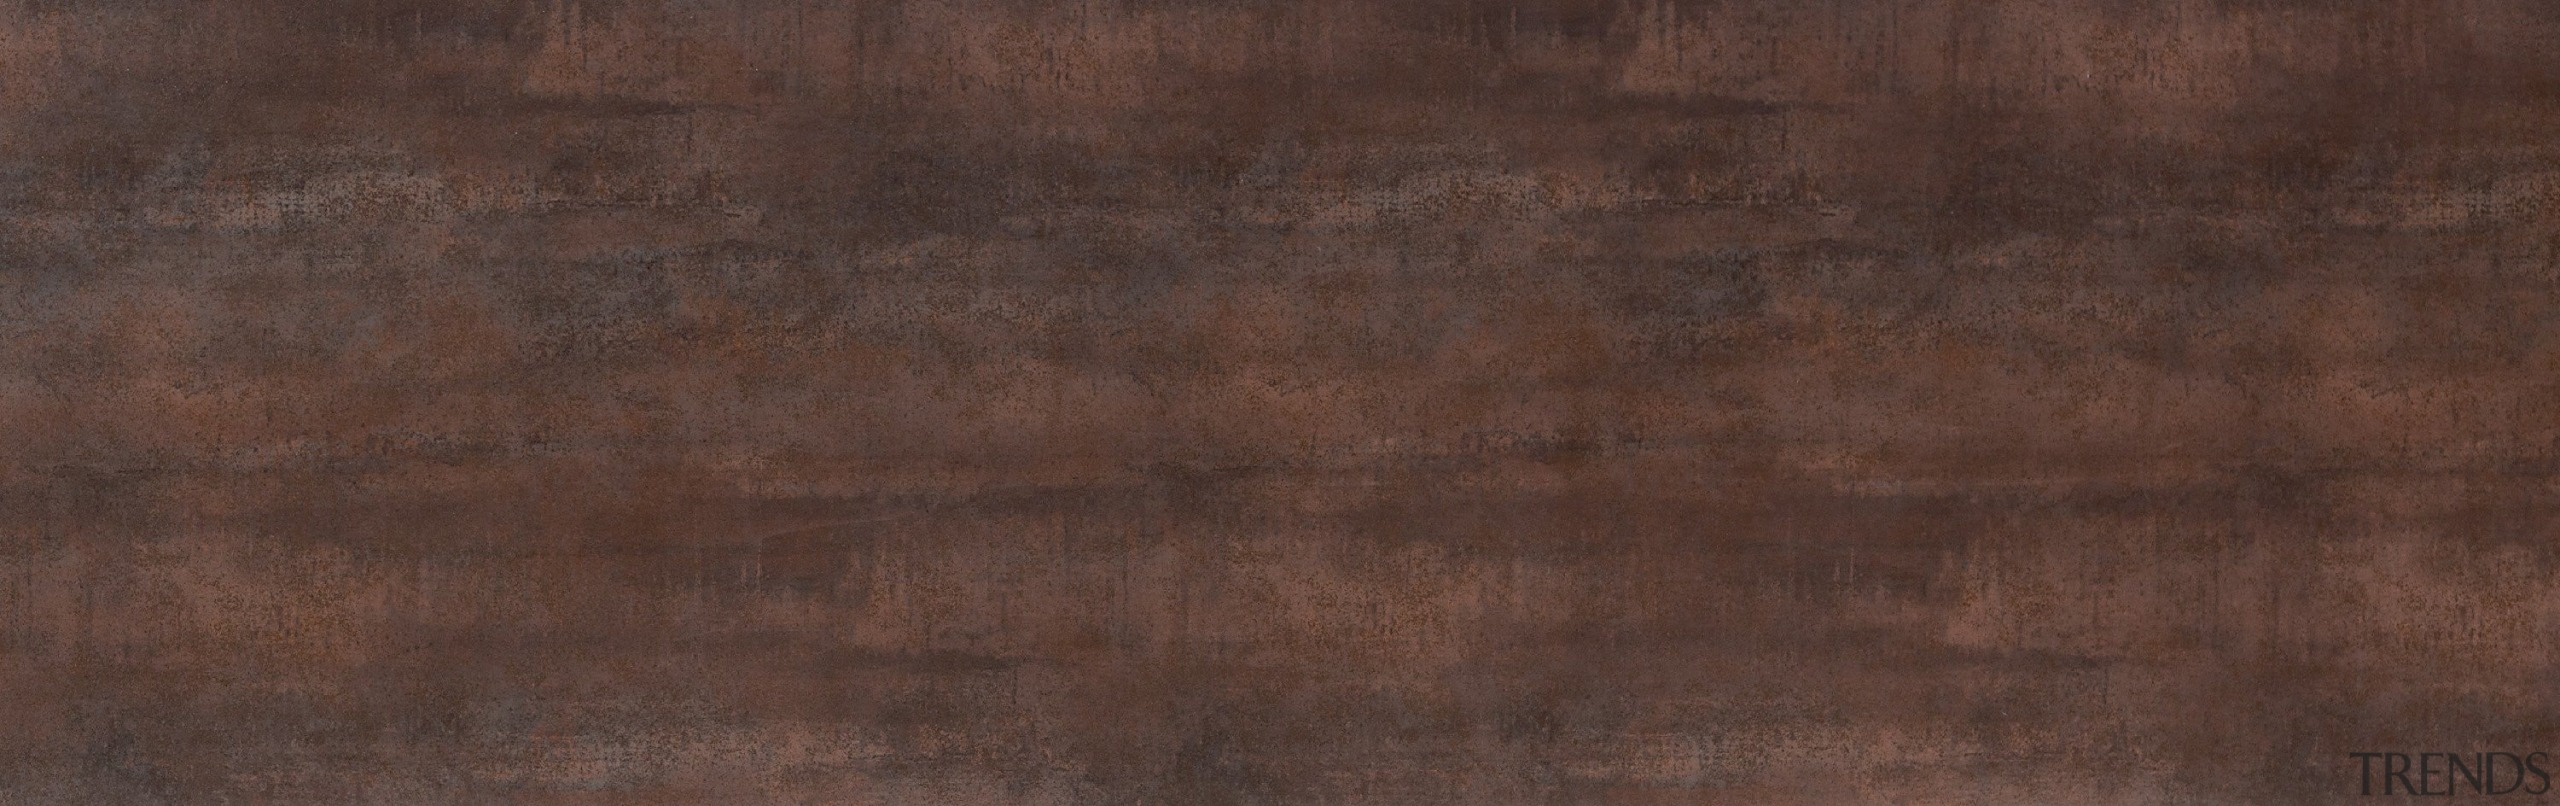 Iron Copper - Iron Copper - brown | brown, floor, flooring, hardwood, laminate flooring, plank, texture, wood, wood flooring, wood stain, red, black